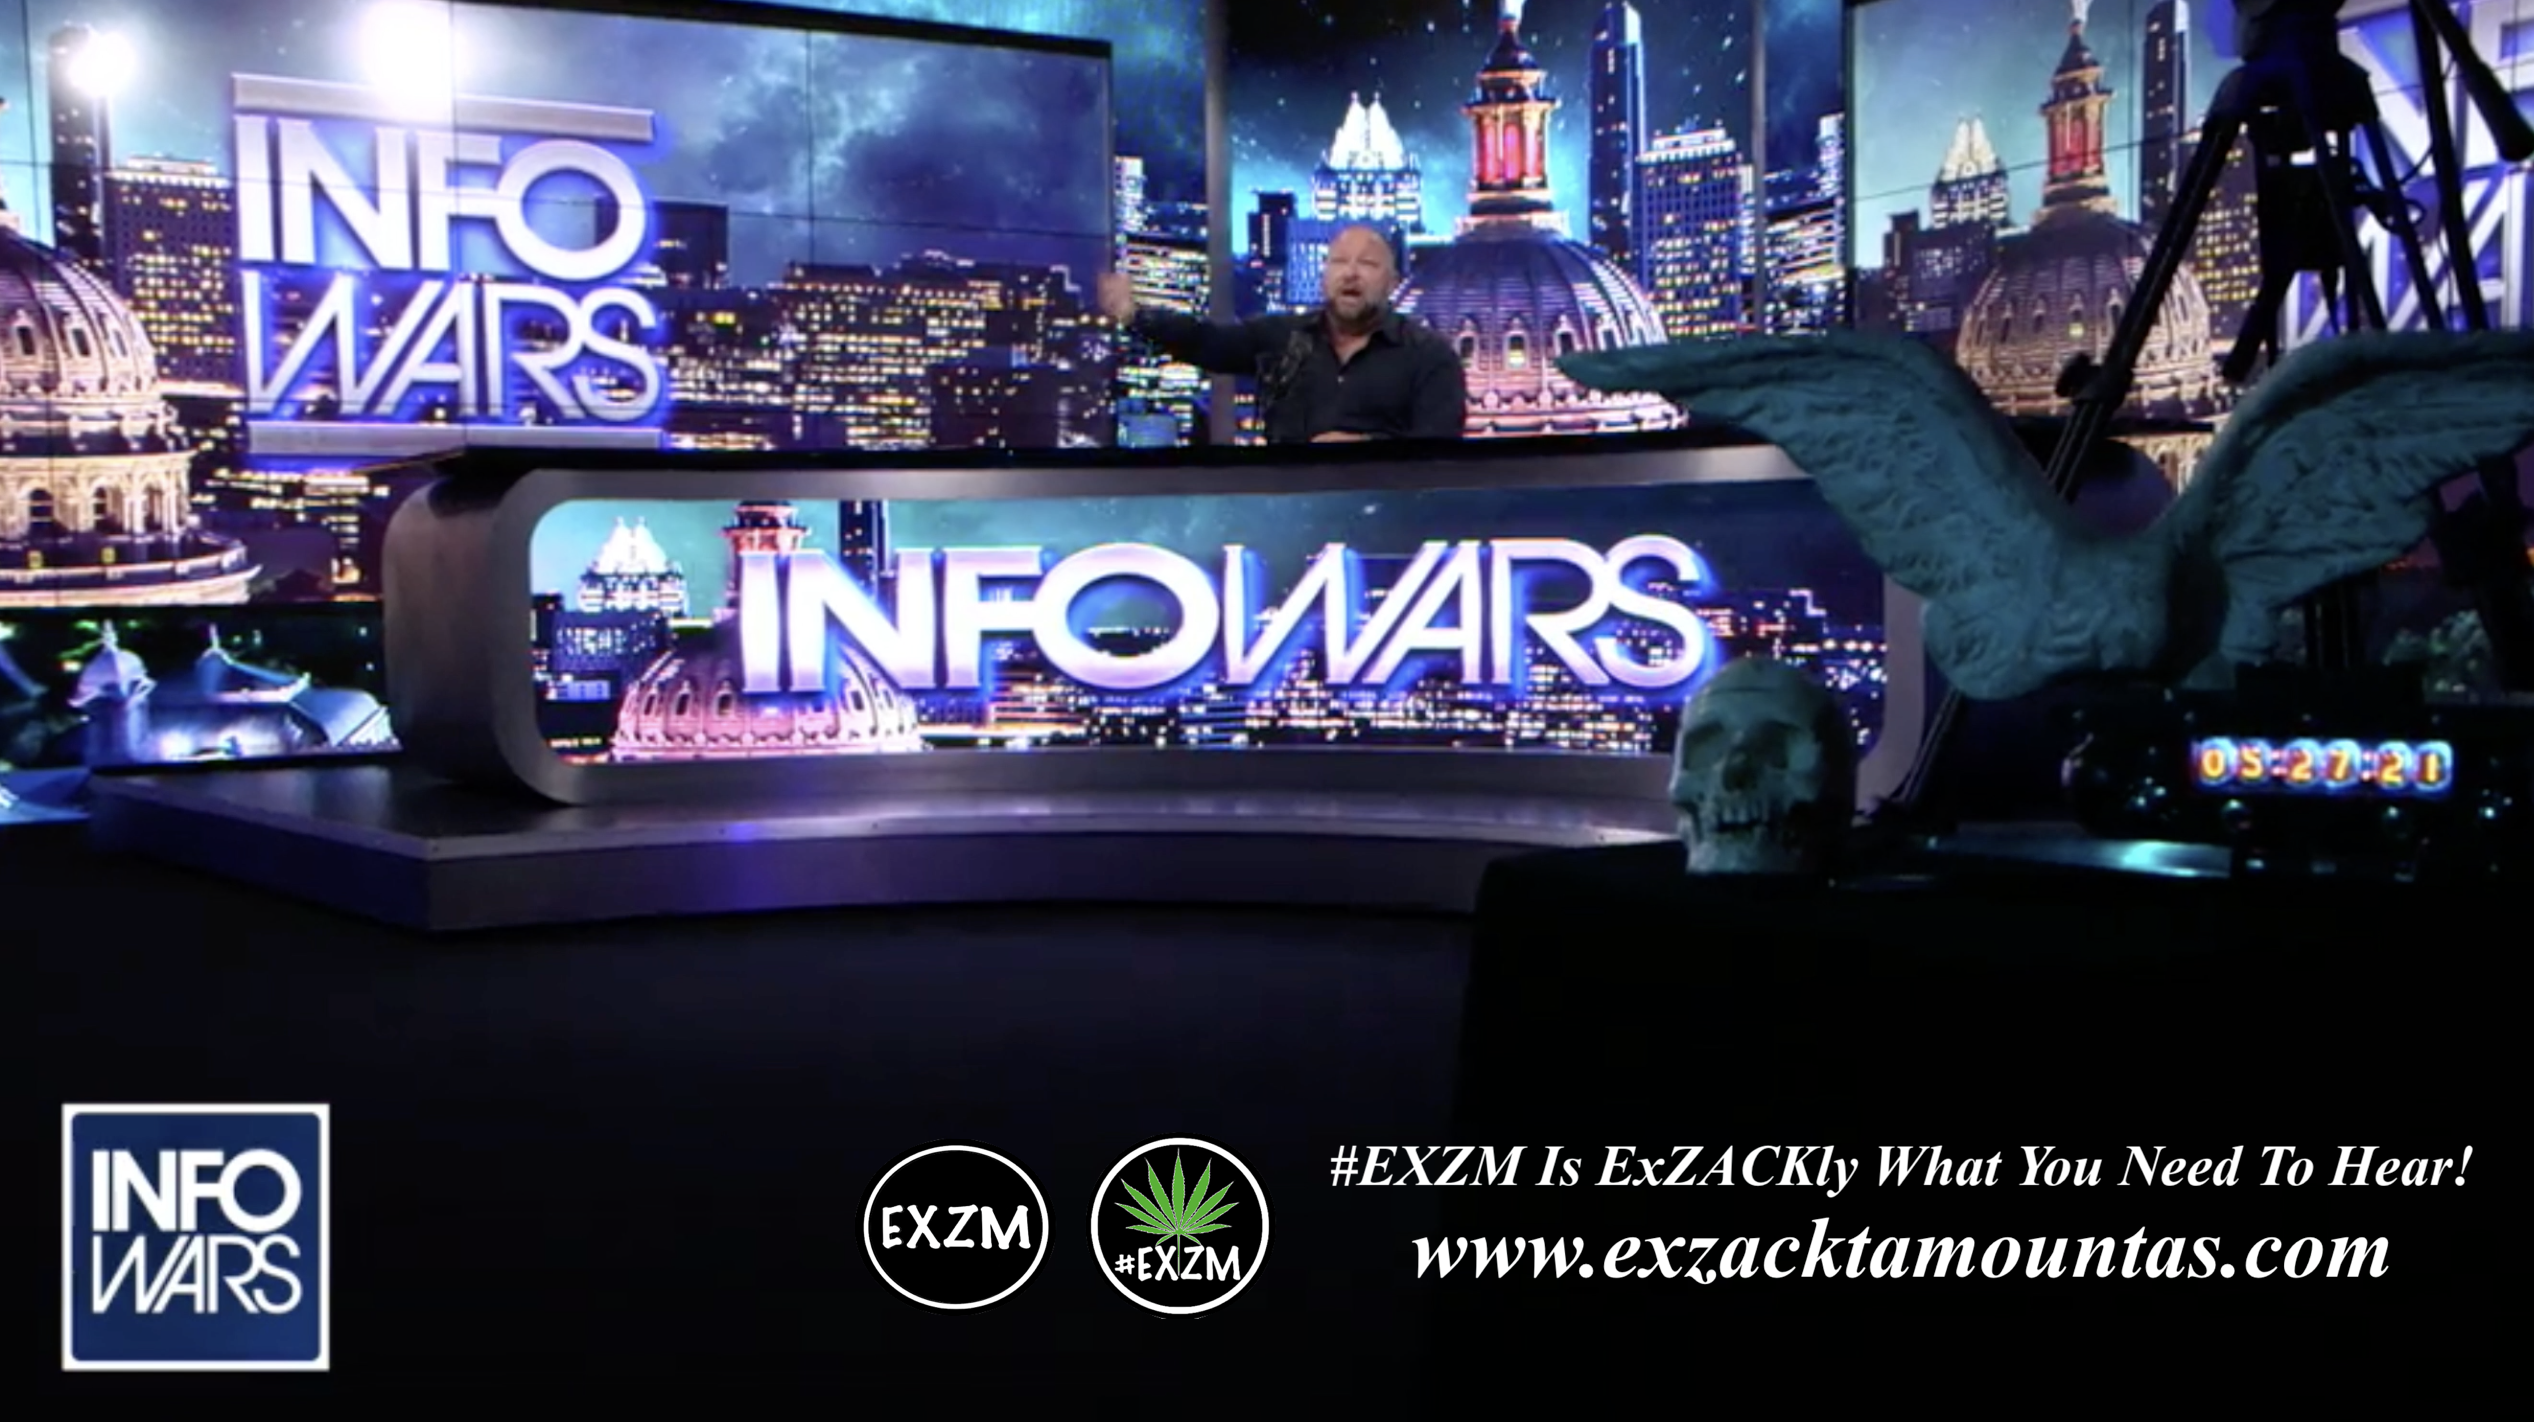 Alex Jones Live In Infowars Studio Human Skull Angel Wings EXZM Zack Mount May 27th 2021 copy